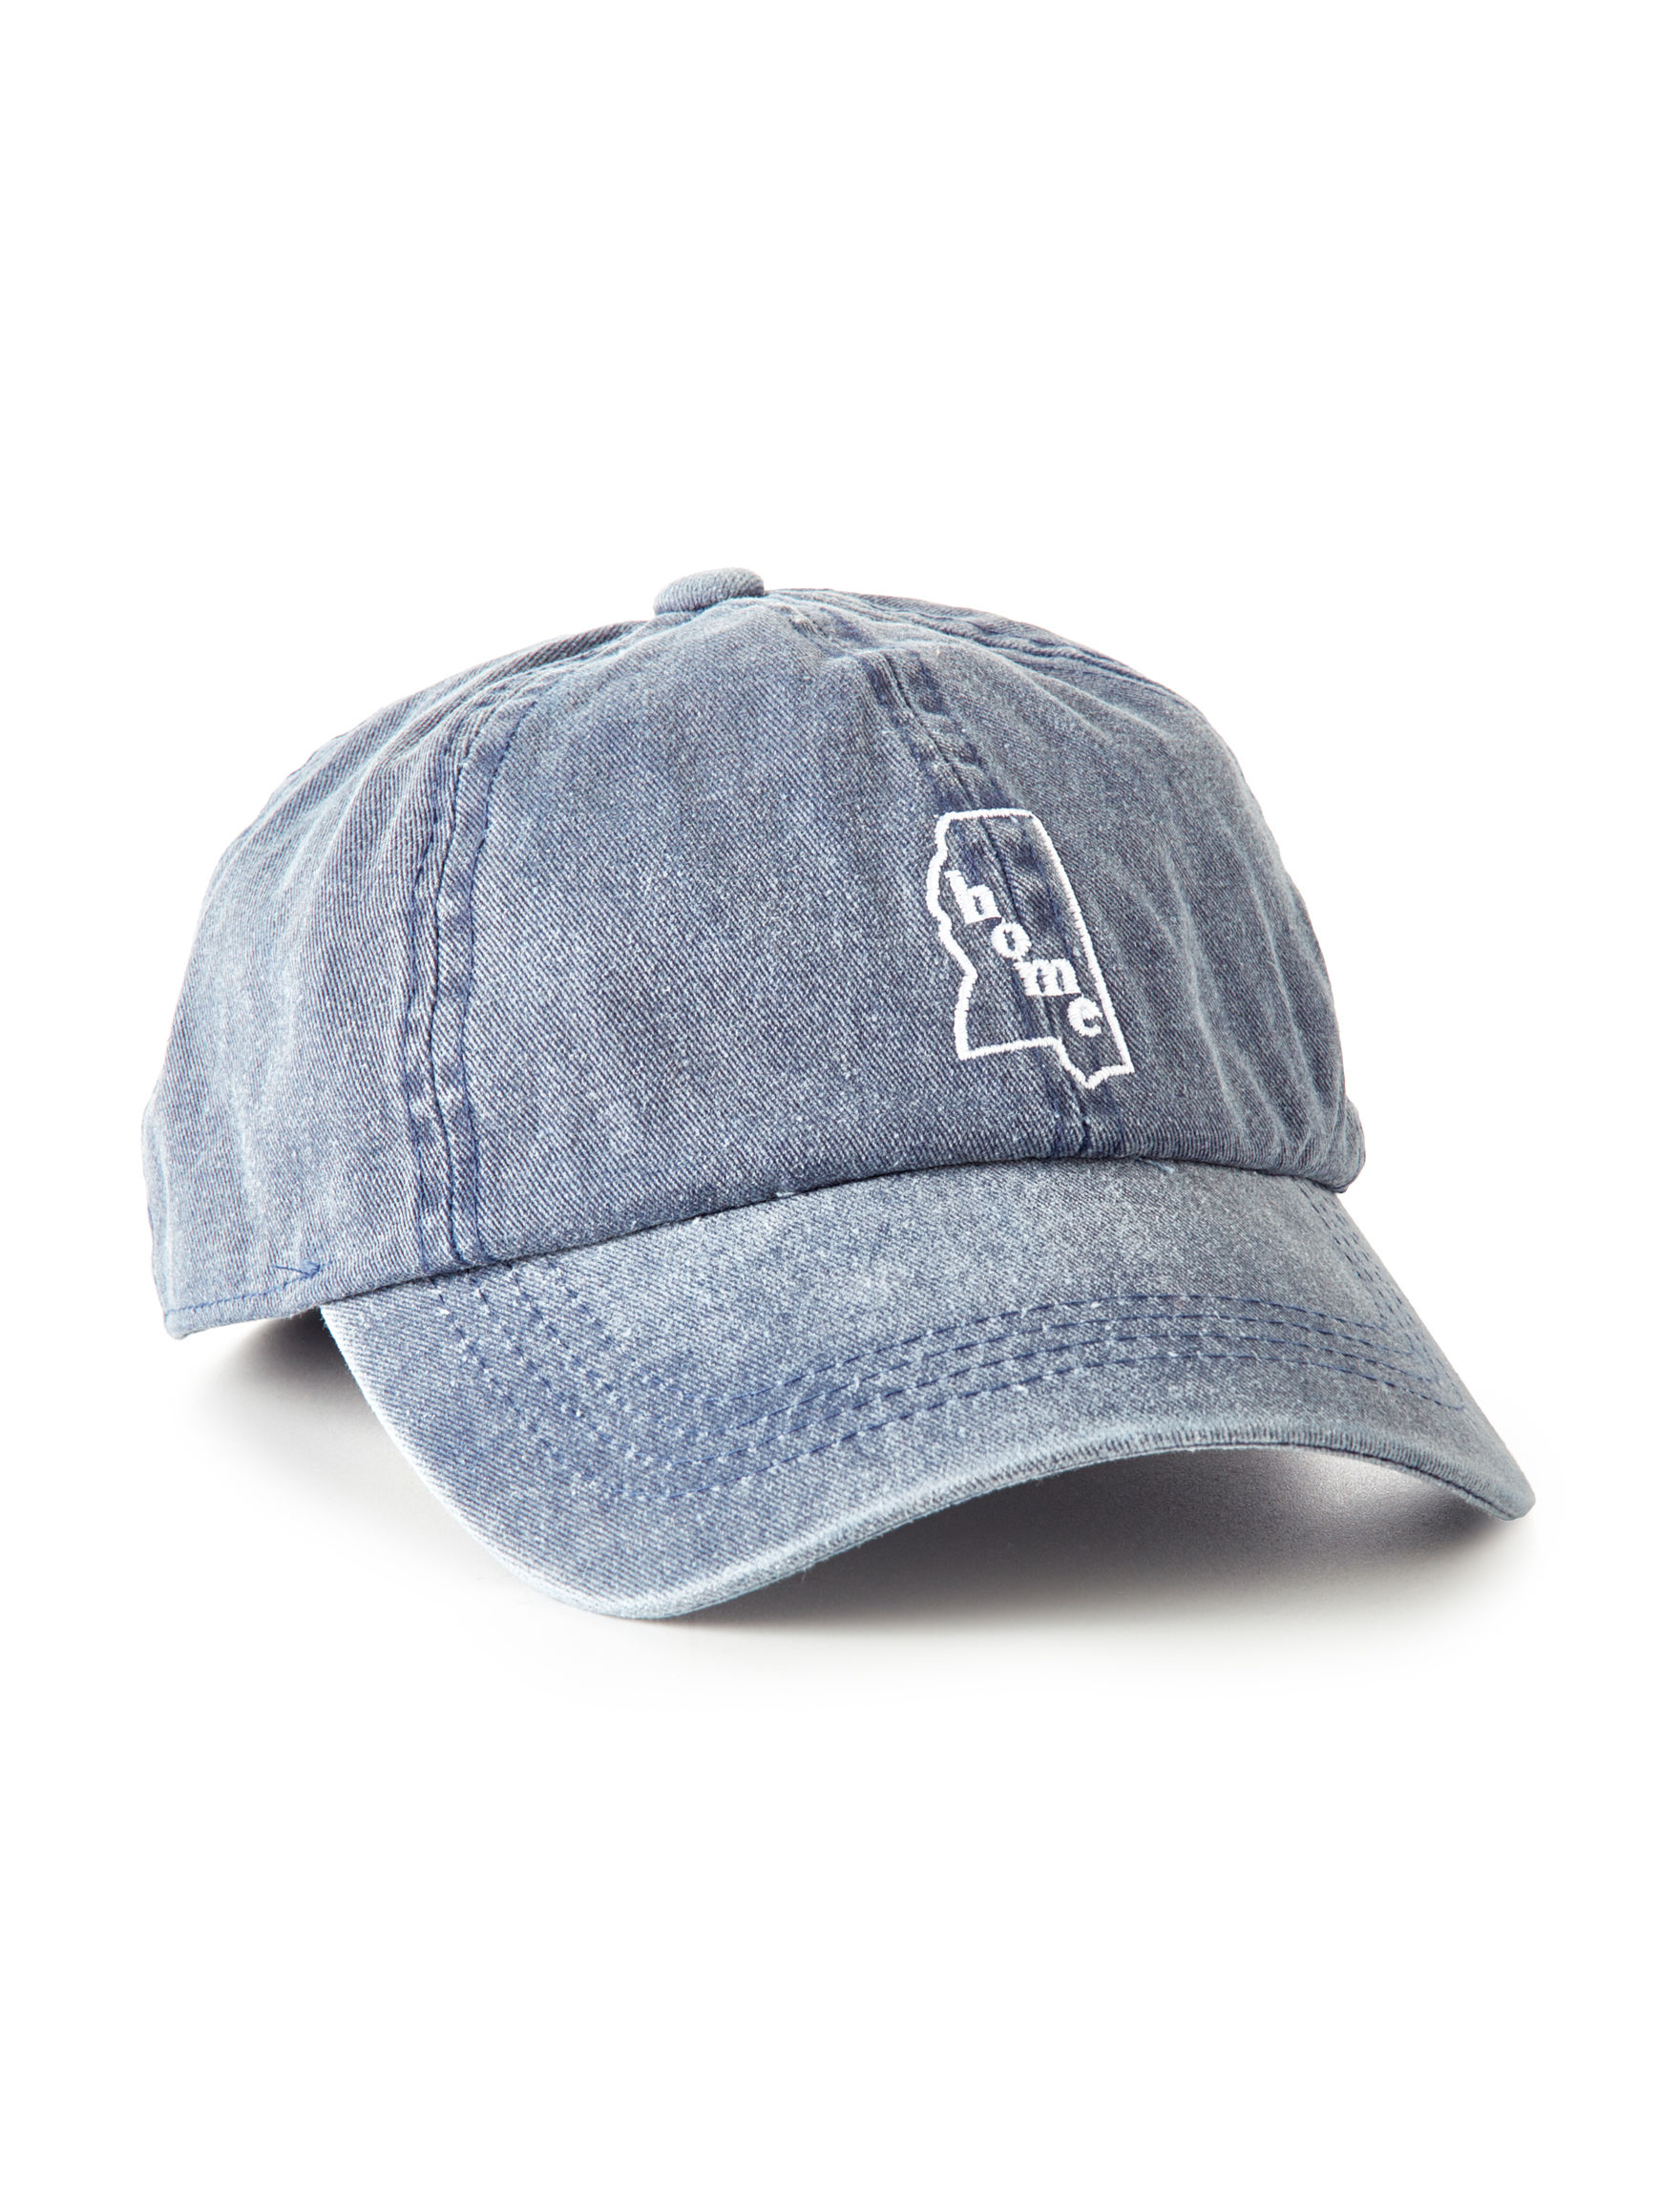 David & Young Blue Hats & Headwear